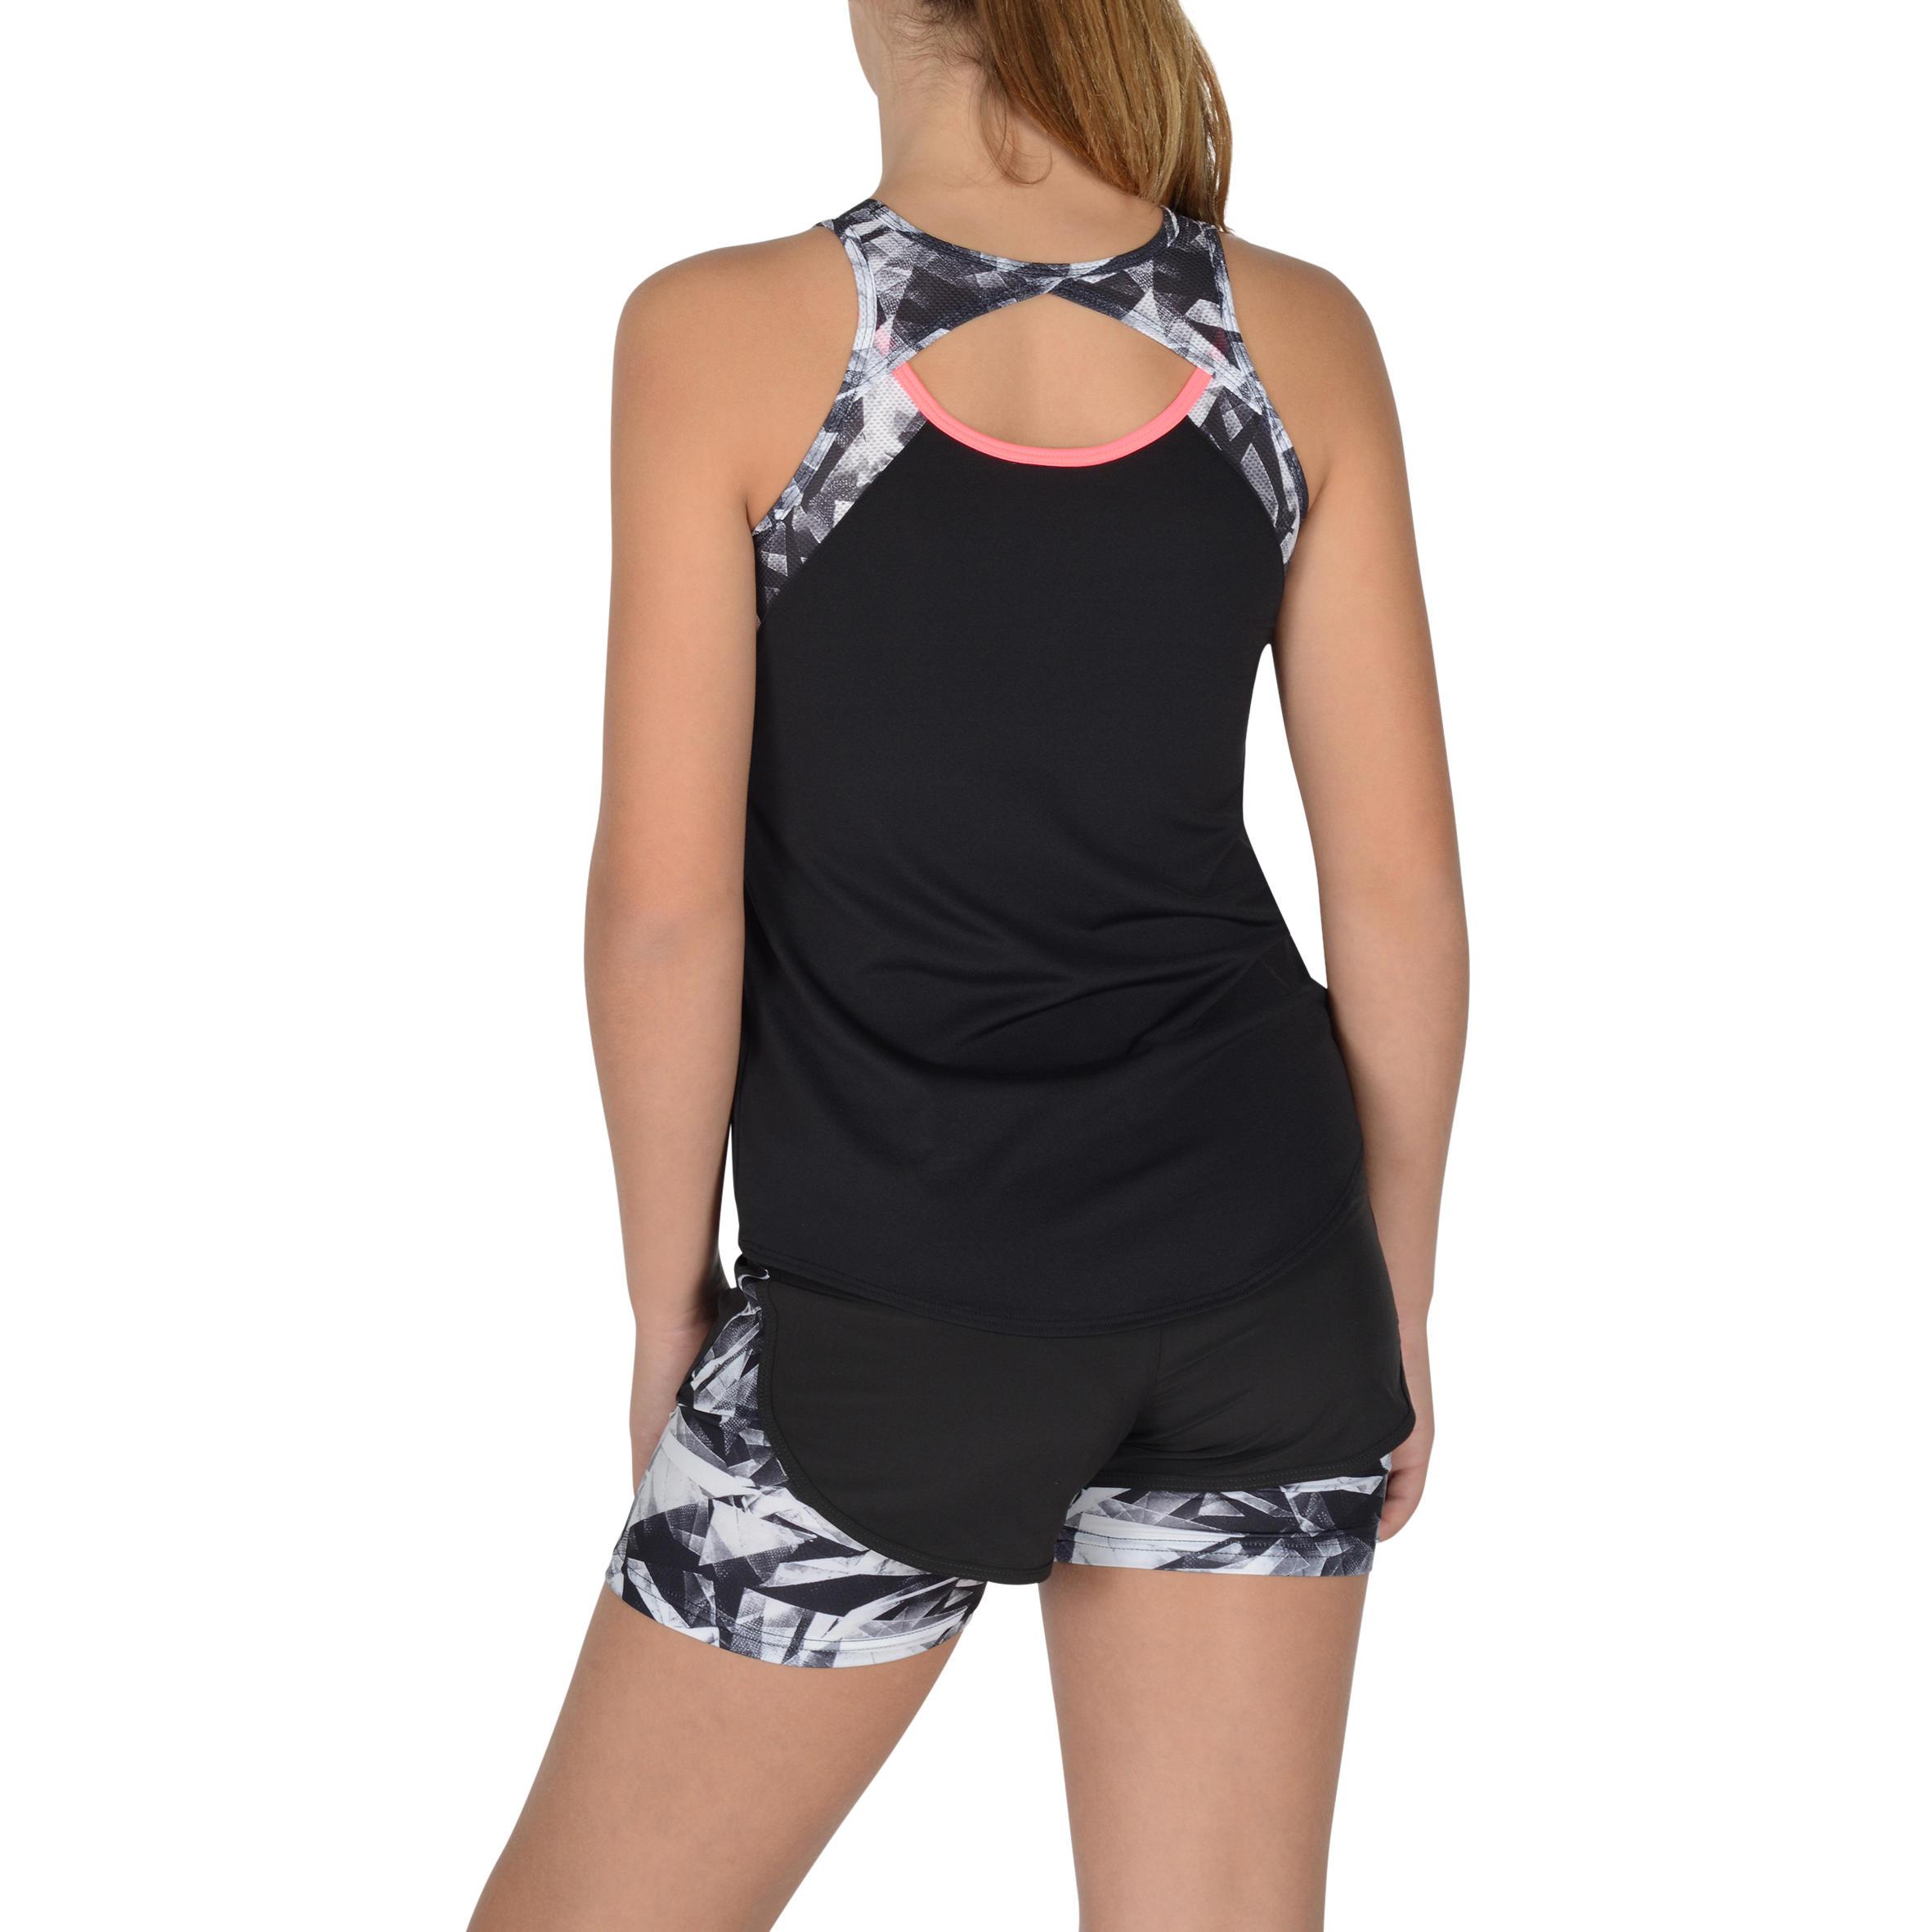 960 Girls' Gym Tank Top - Black